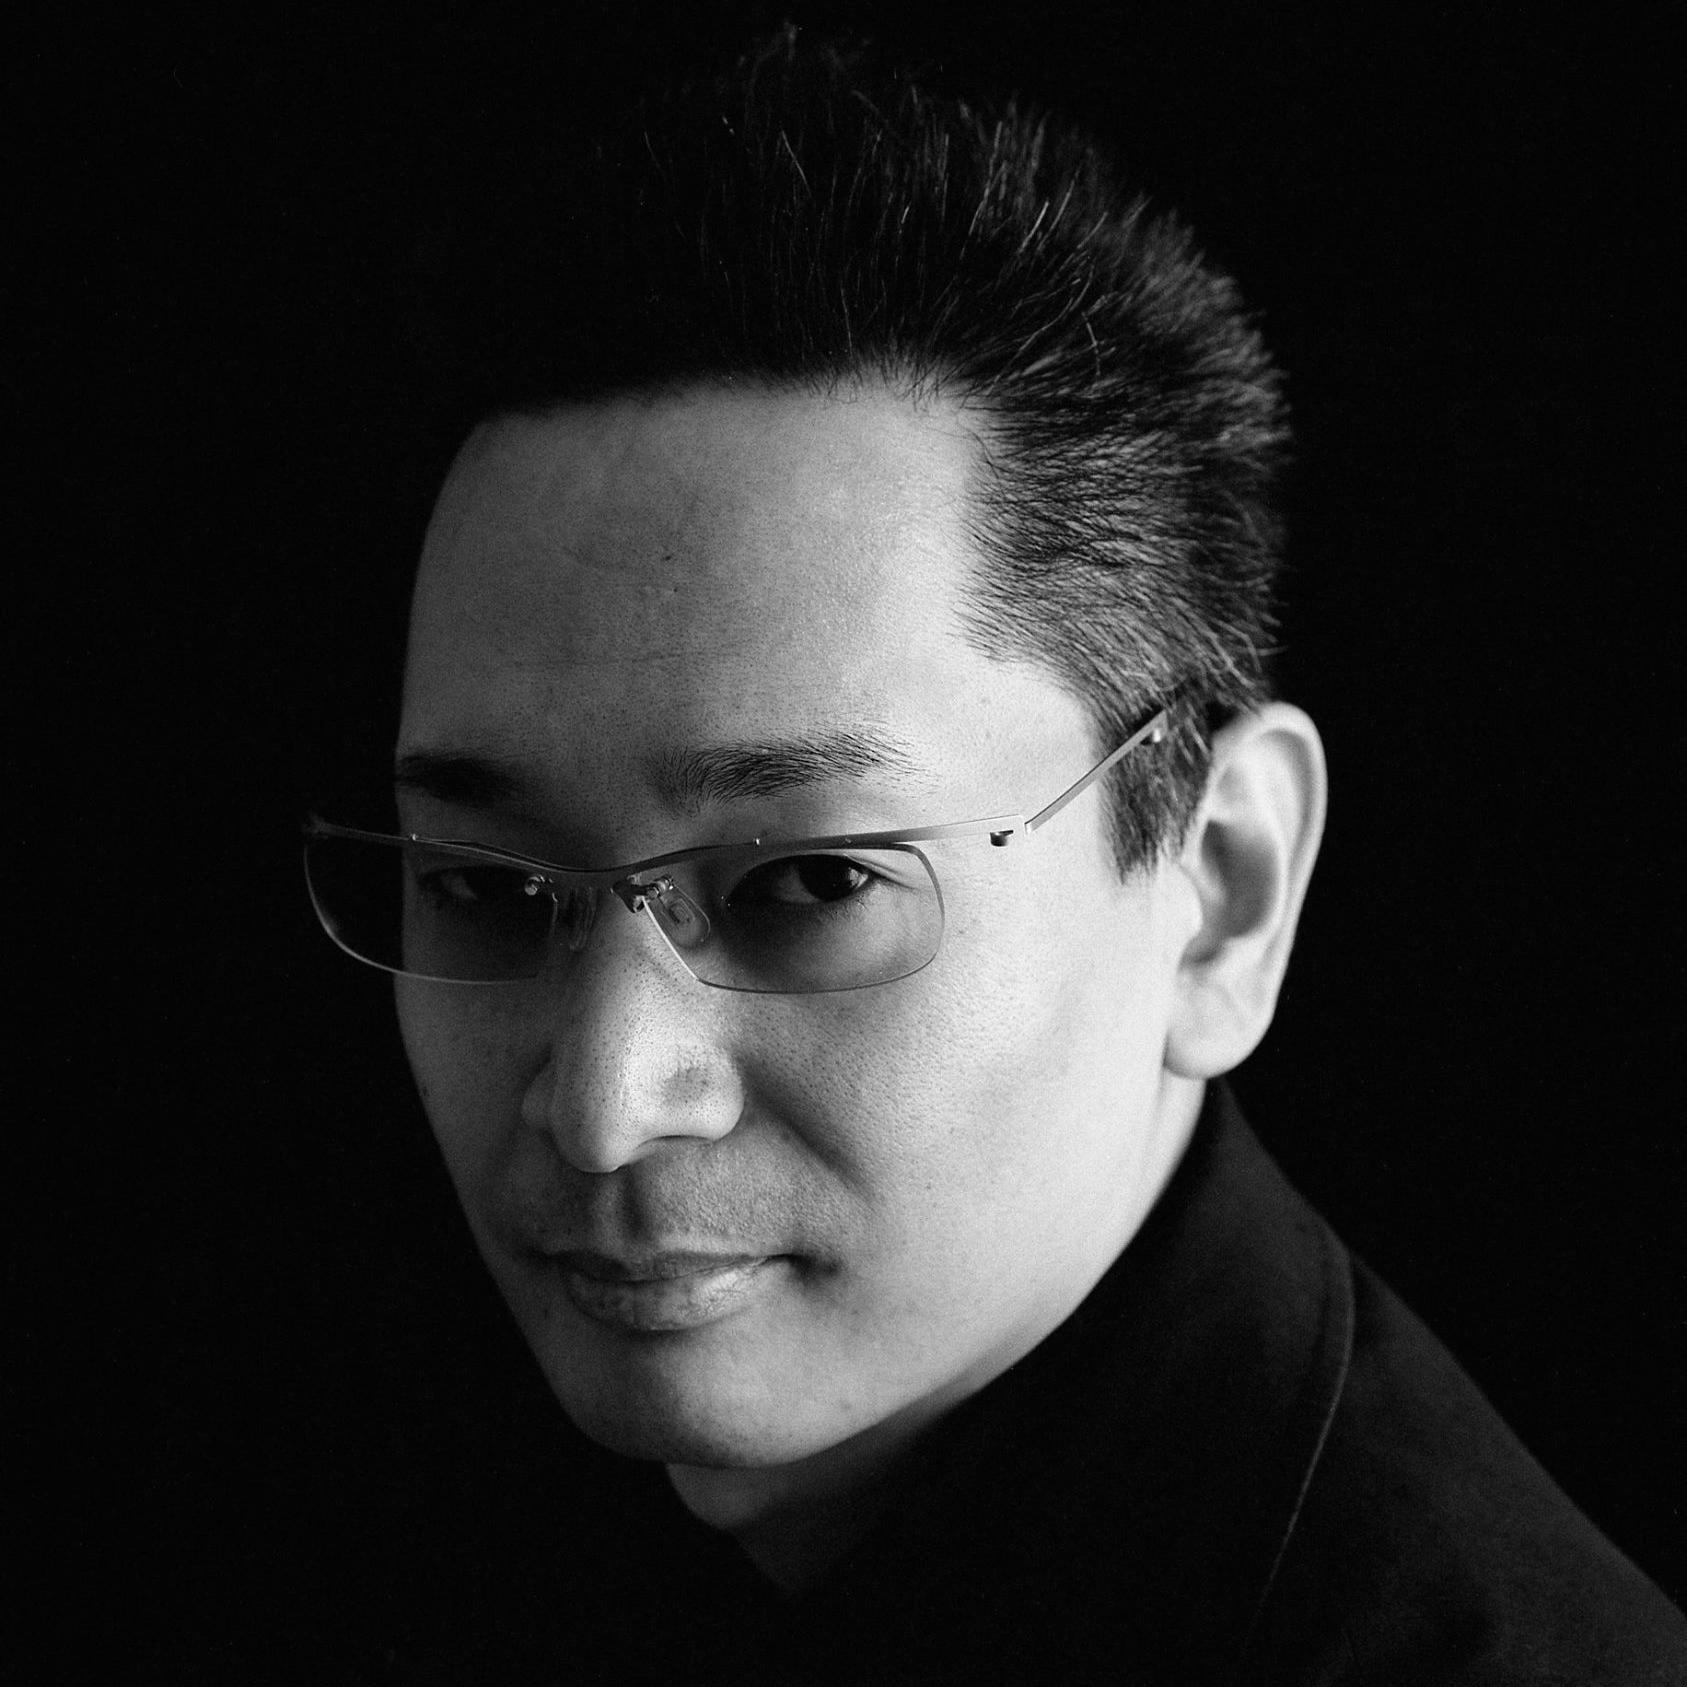 Kazuto Miyata